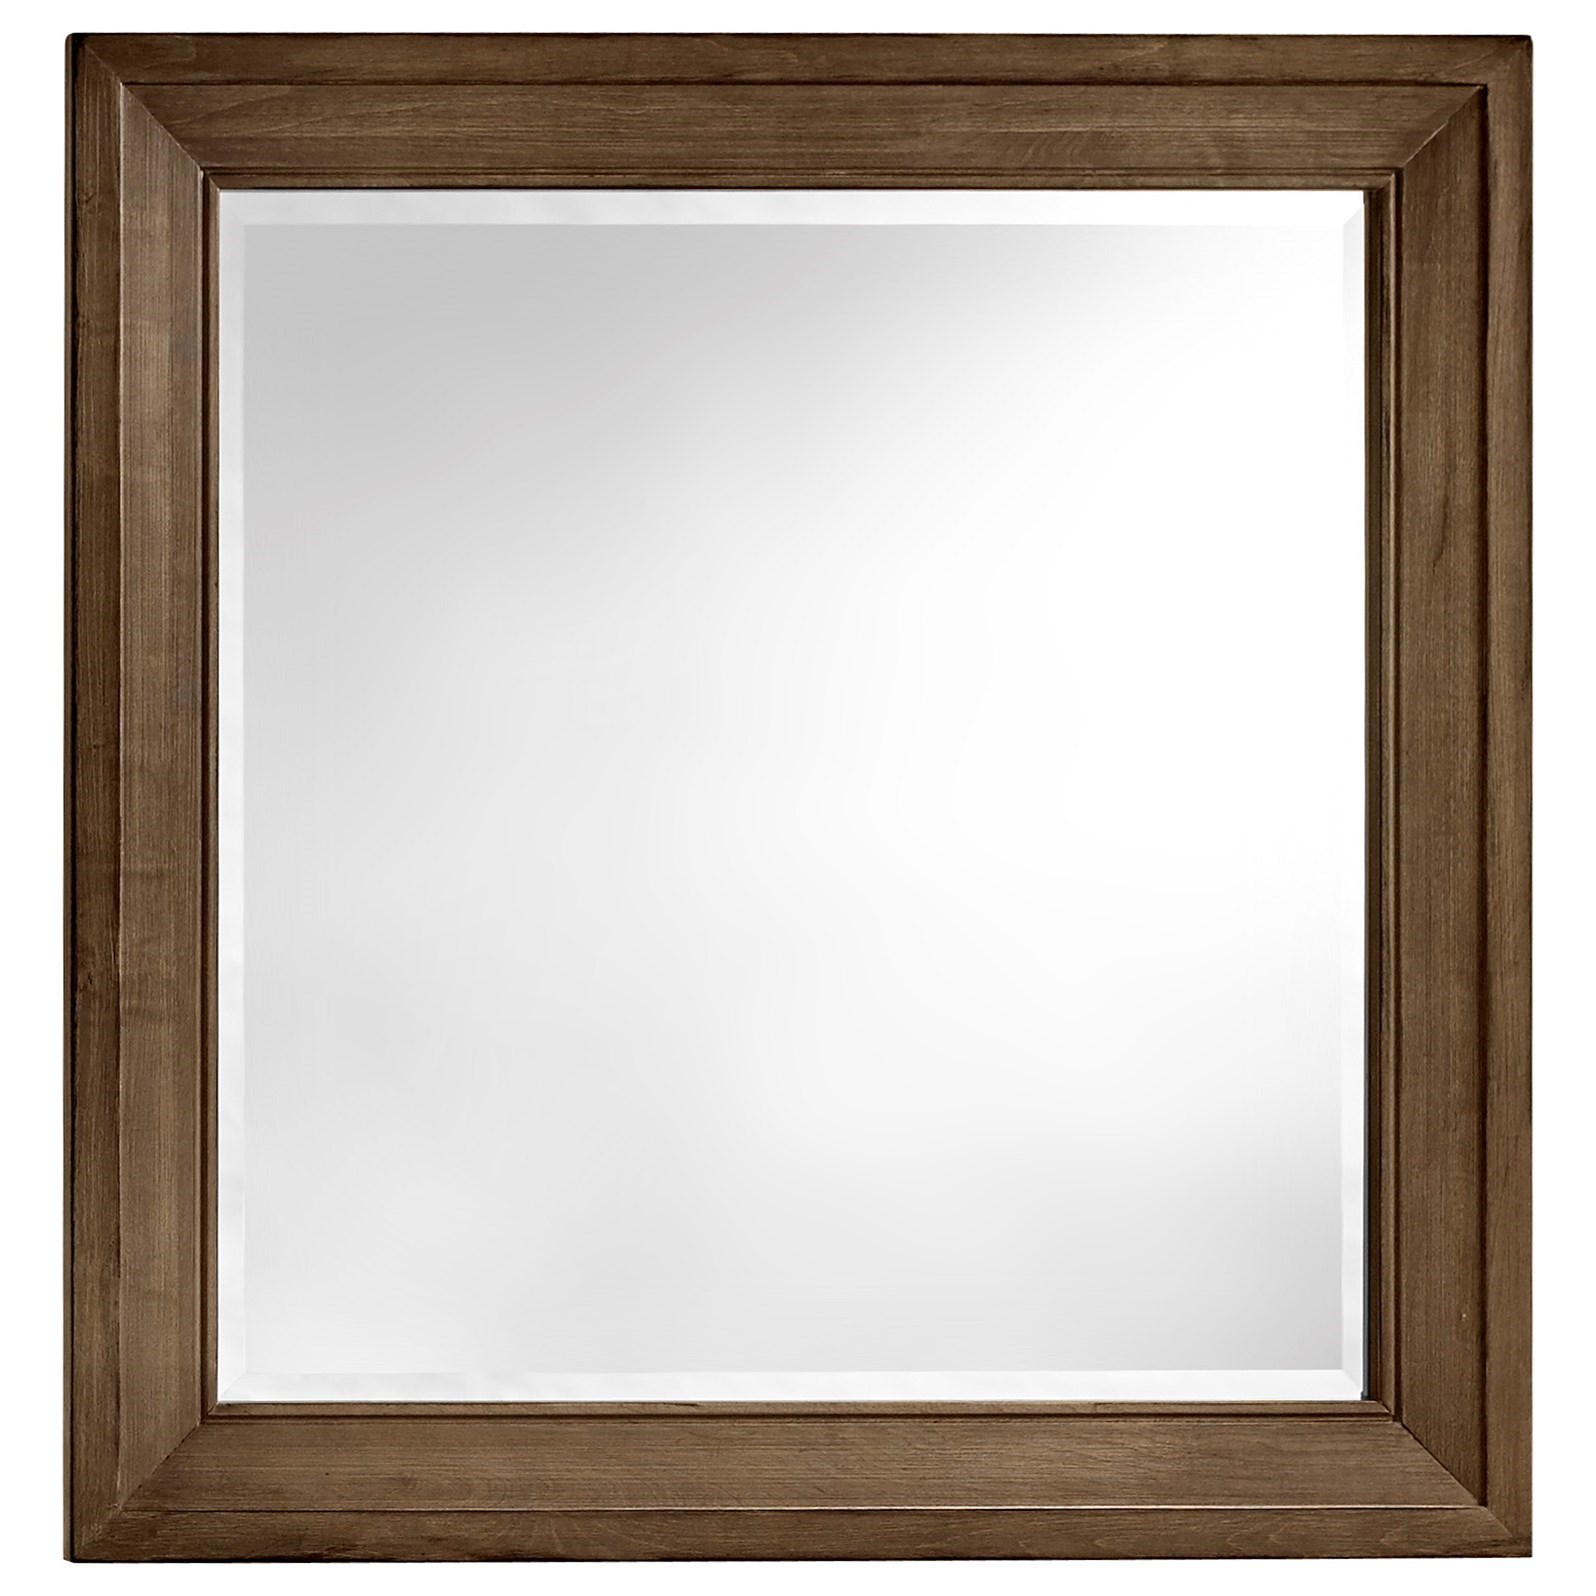 Artisan & Post Maple Road Landscape Mirror - Beveled glass - Item Number: 117-446